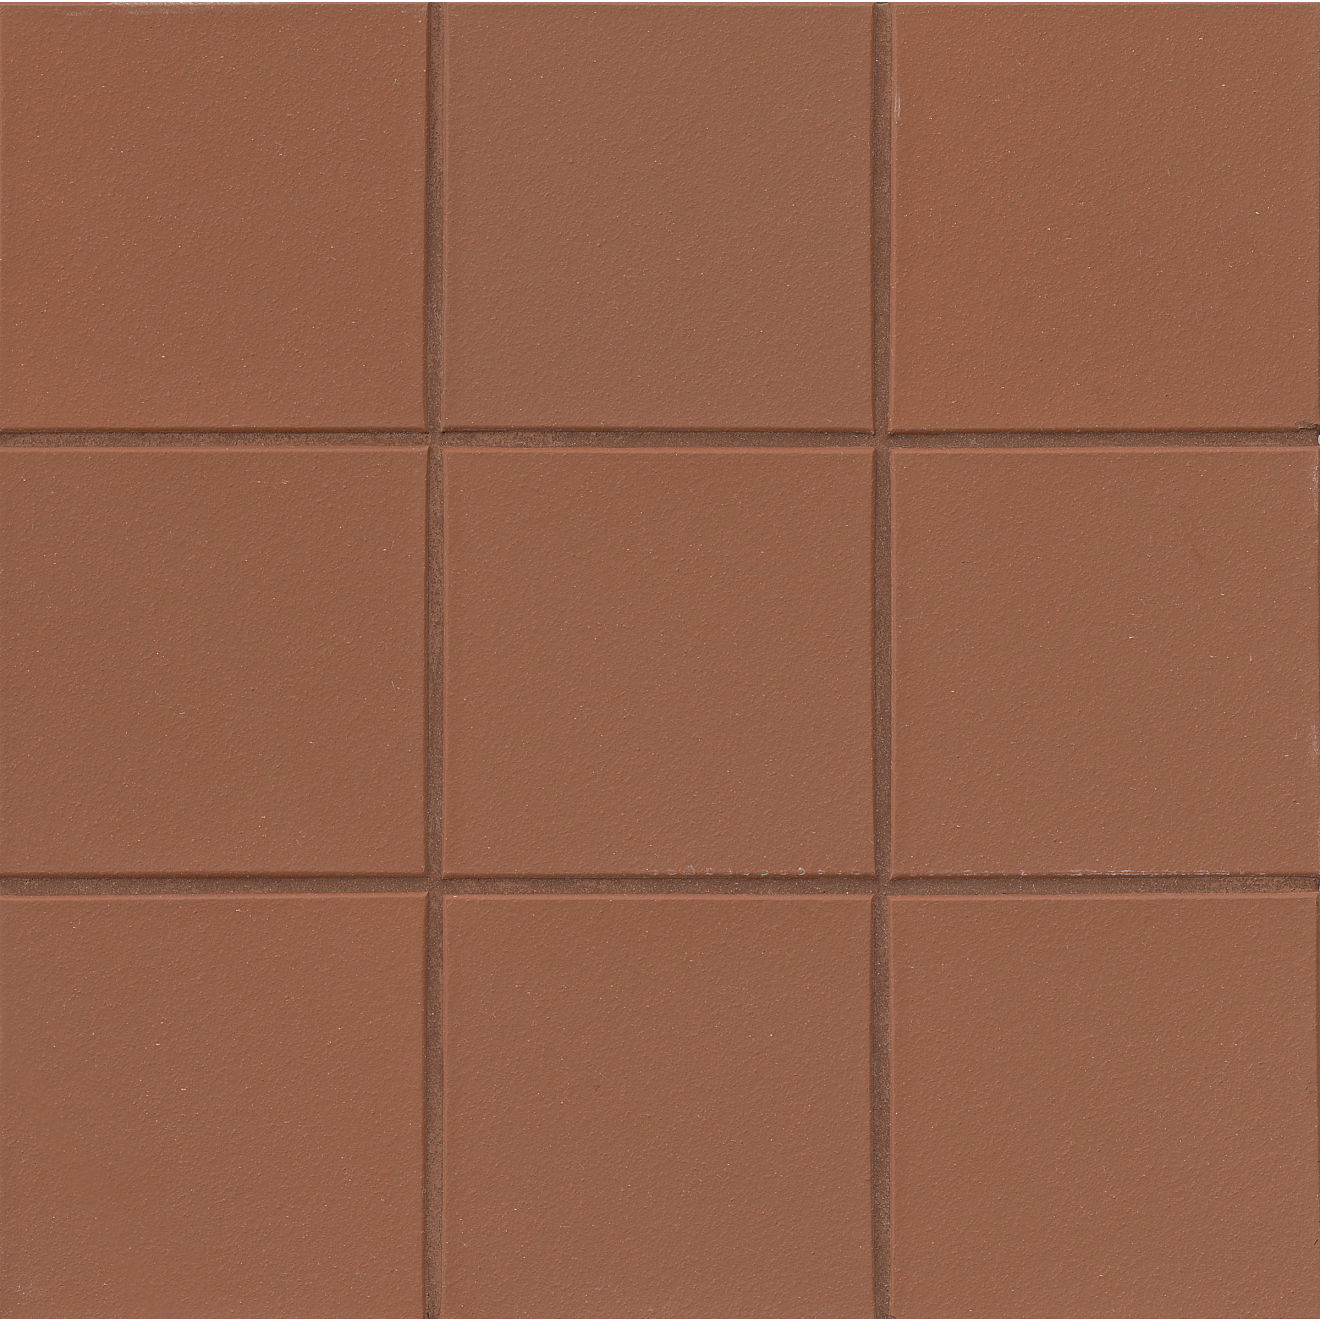 Metropolitan 6 X 6 Floor Wall Tile In Mayflower Red